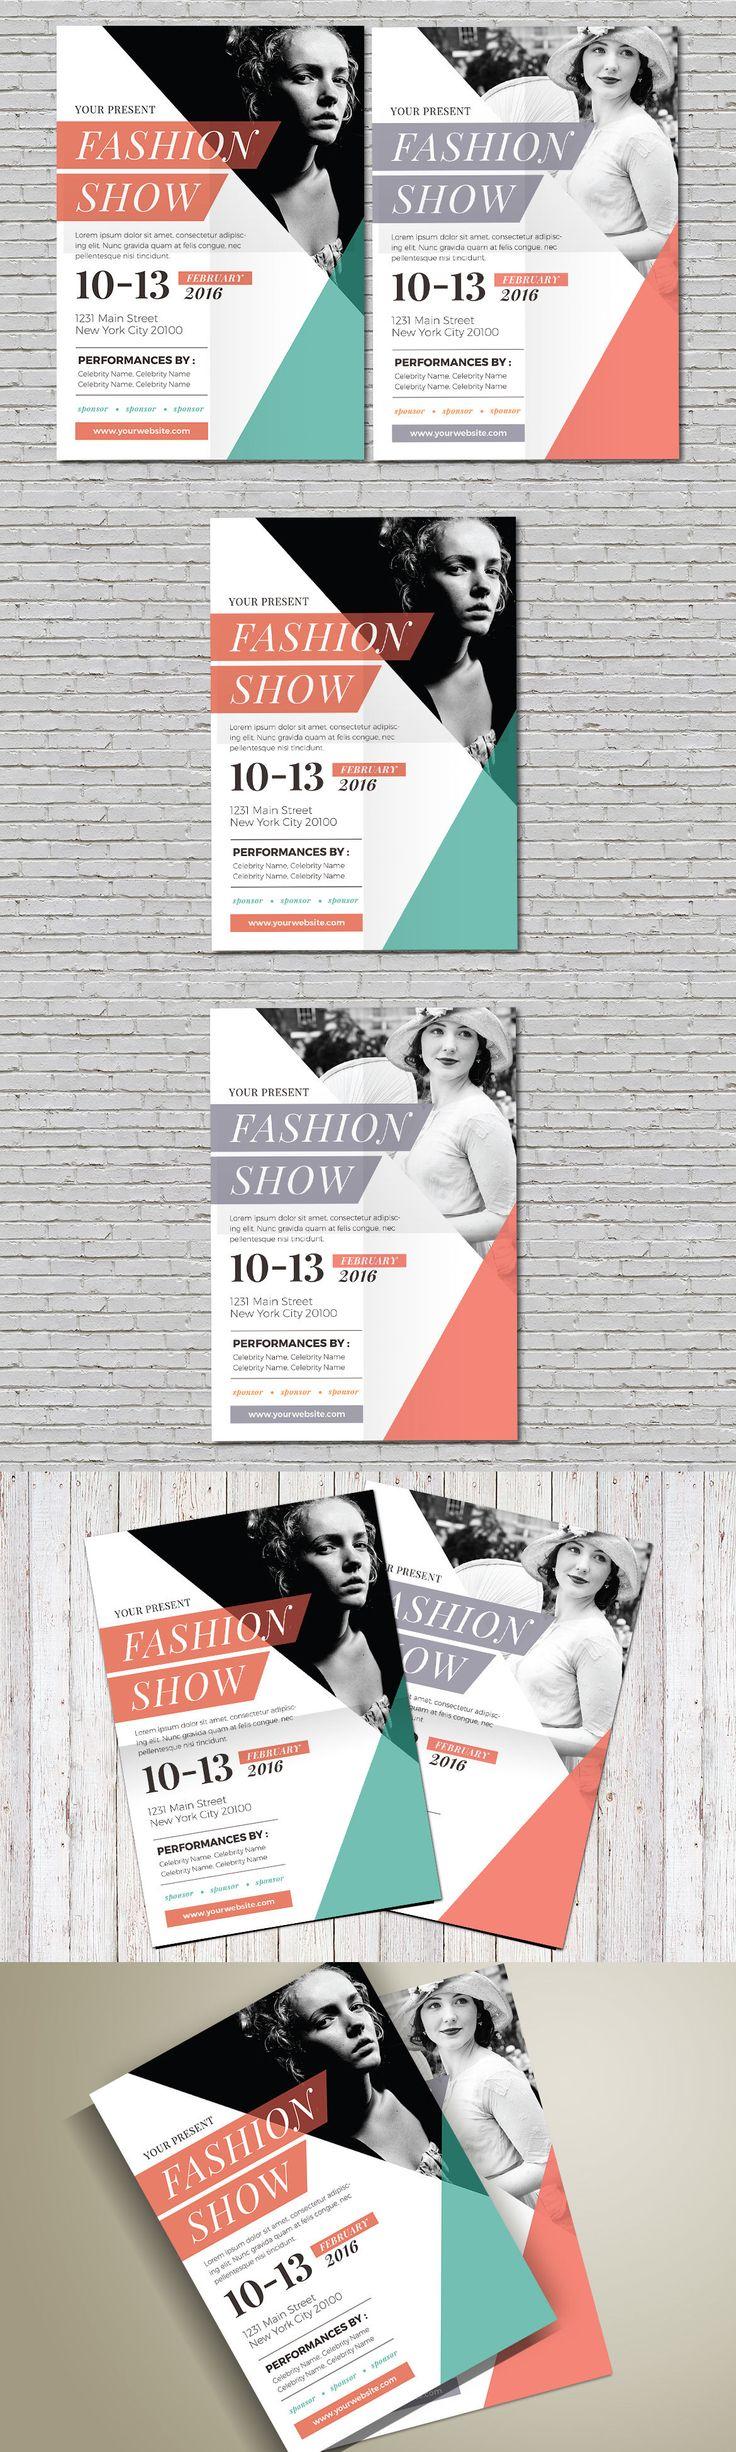 Fashion Show Flyer Template AI, PSD